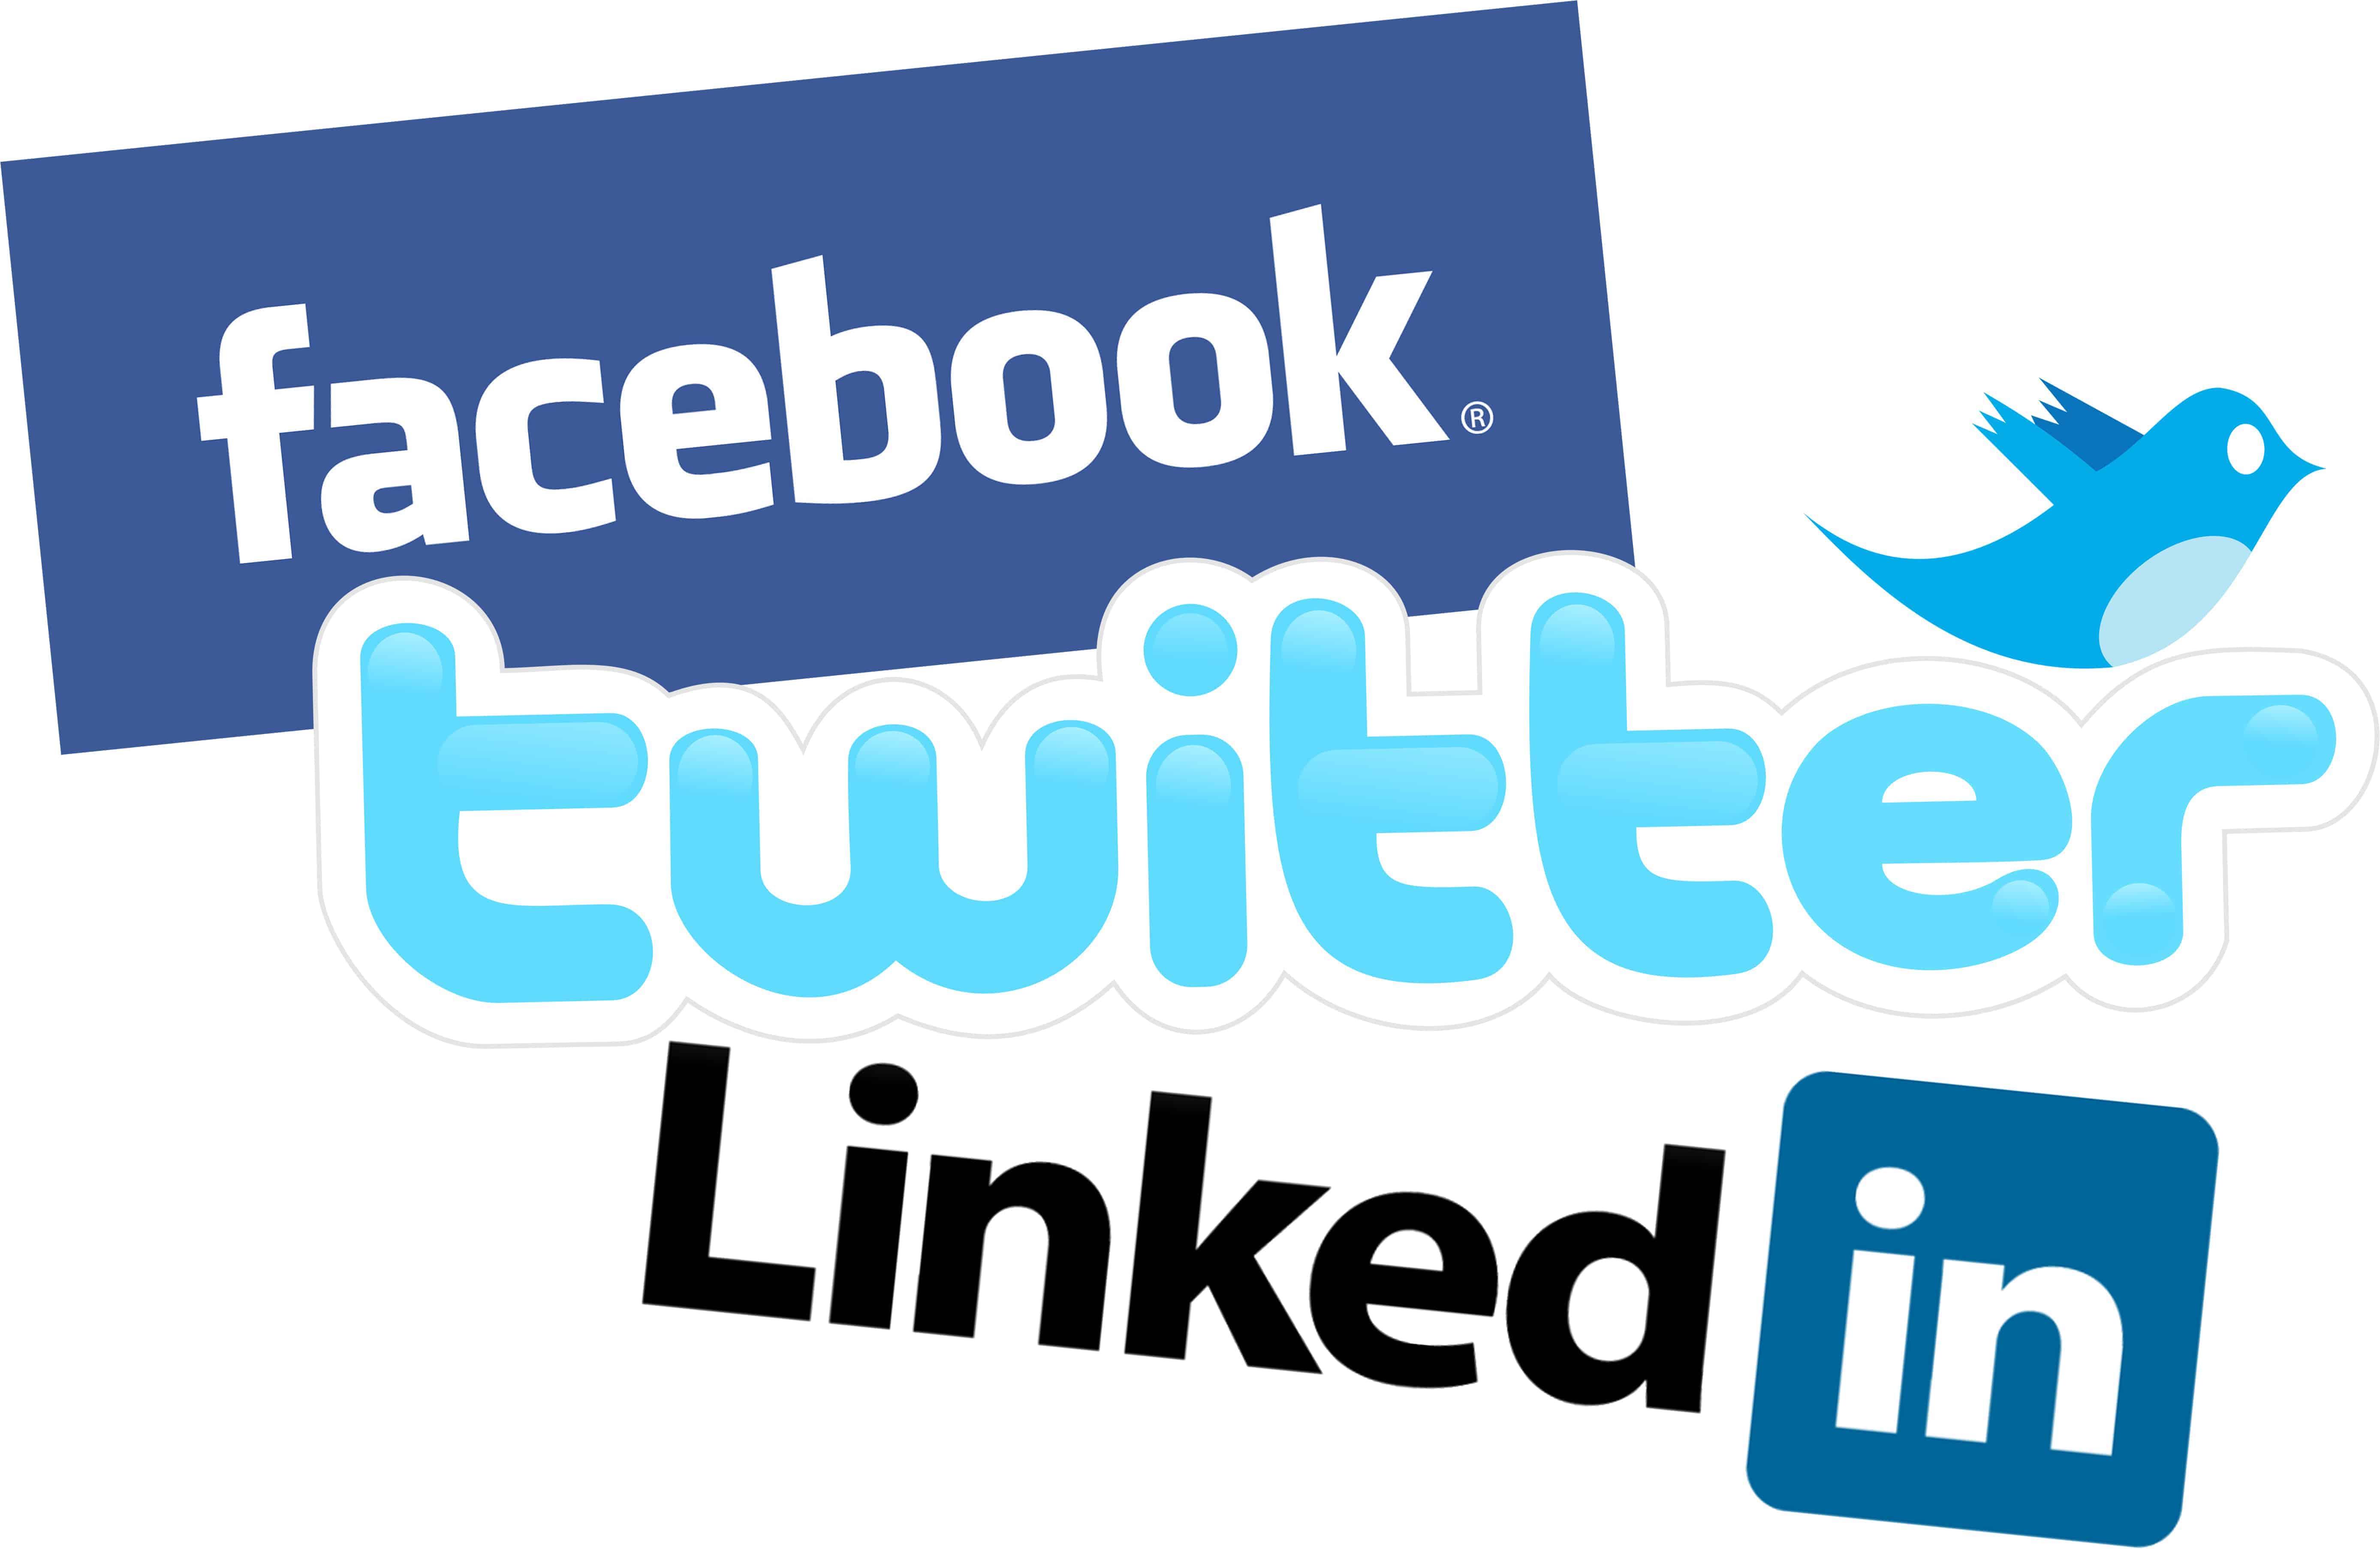 013_social-media-collage.jpg